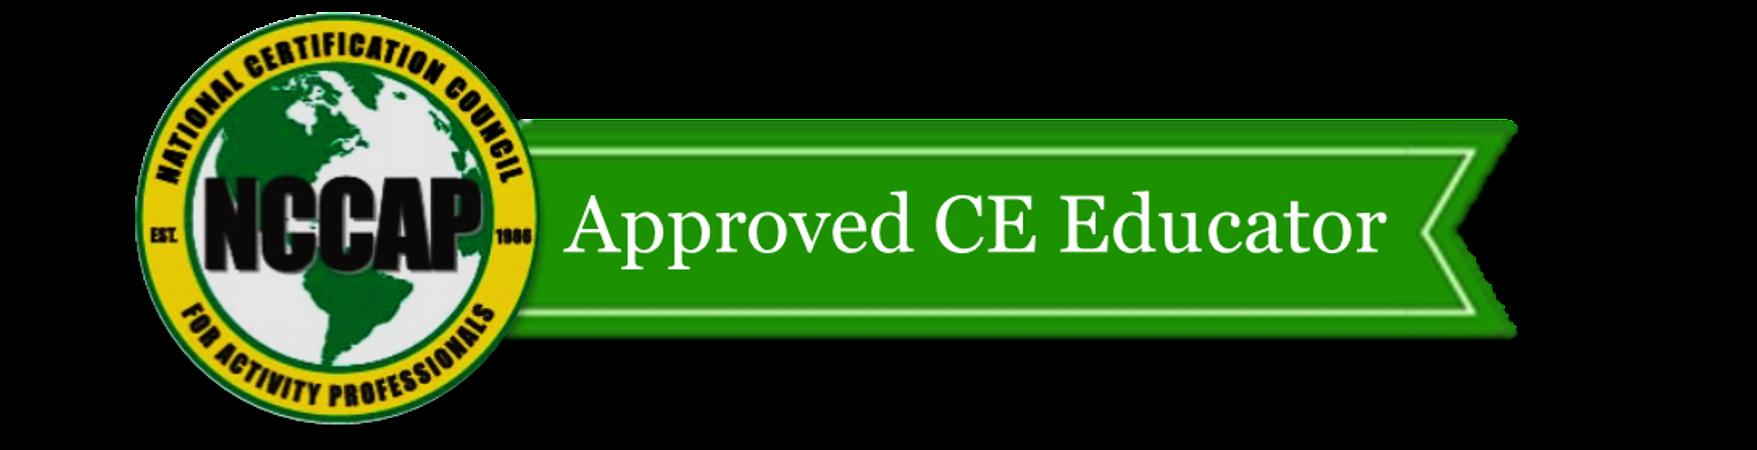 NCCAP Approved CE Provider_Emblem.png